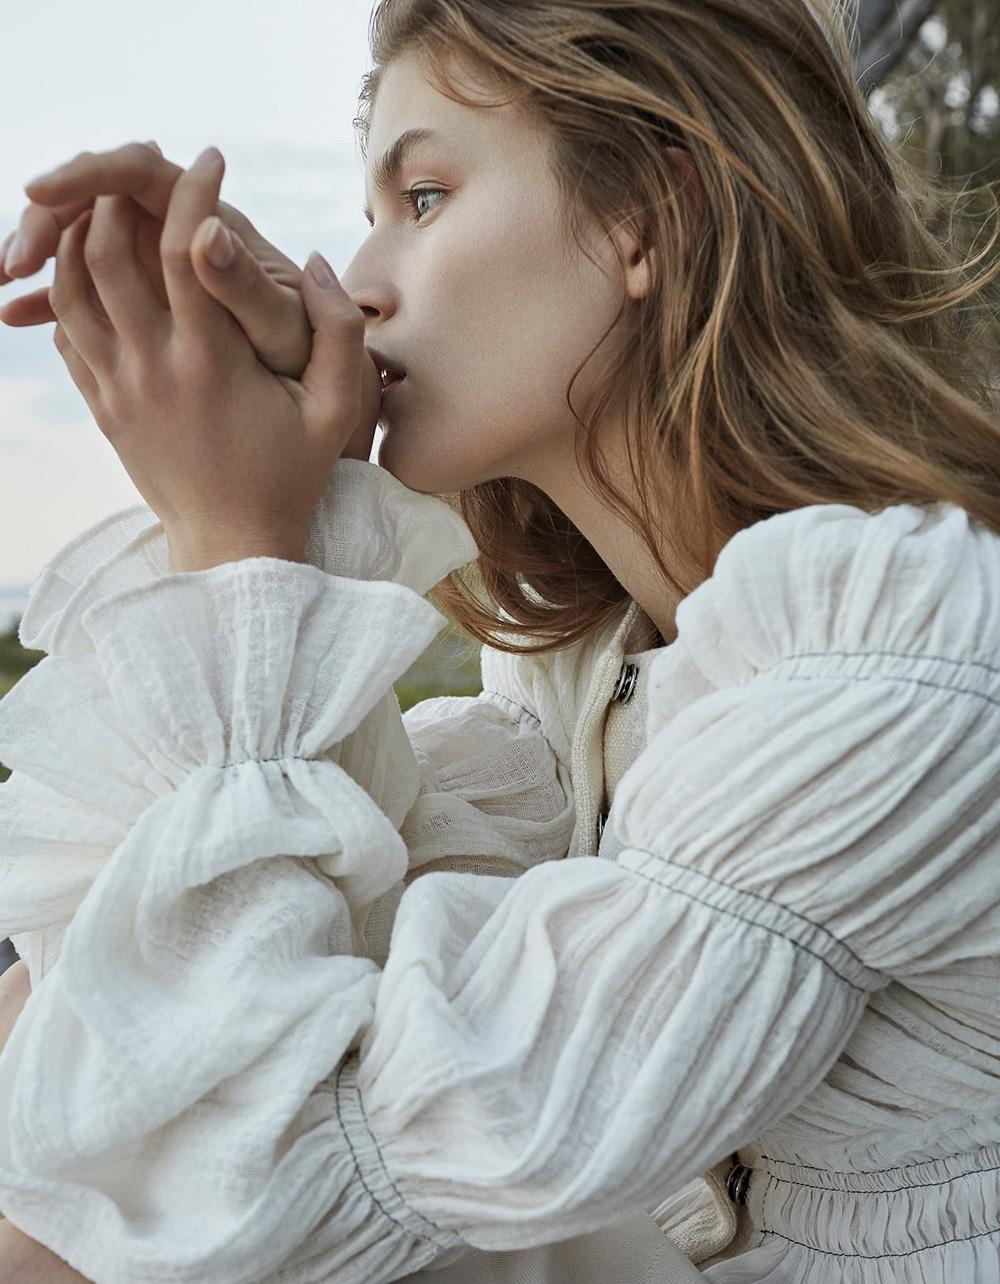 Vogue-Poland-Molly-Smith-Agata-Pospieszynska-3.jpg